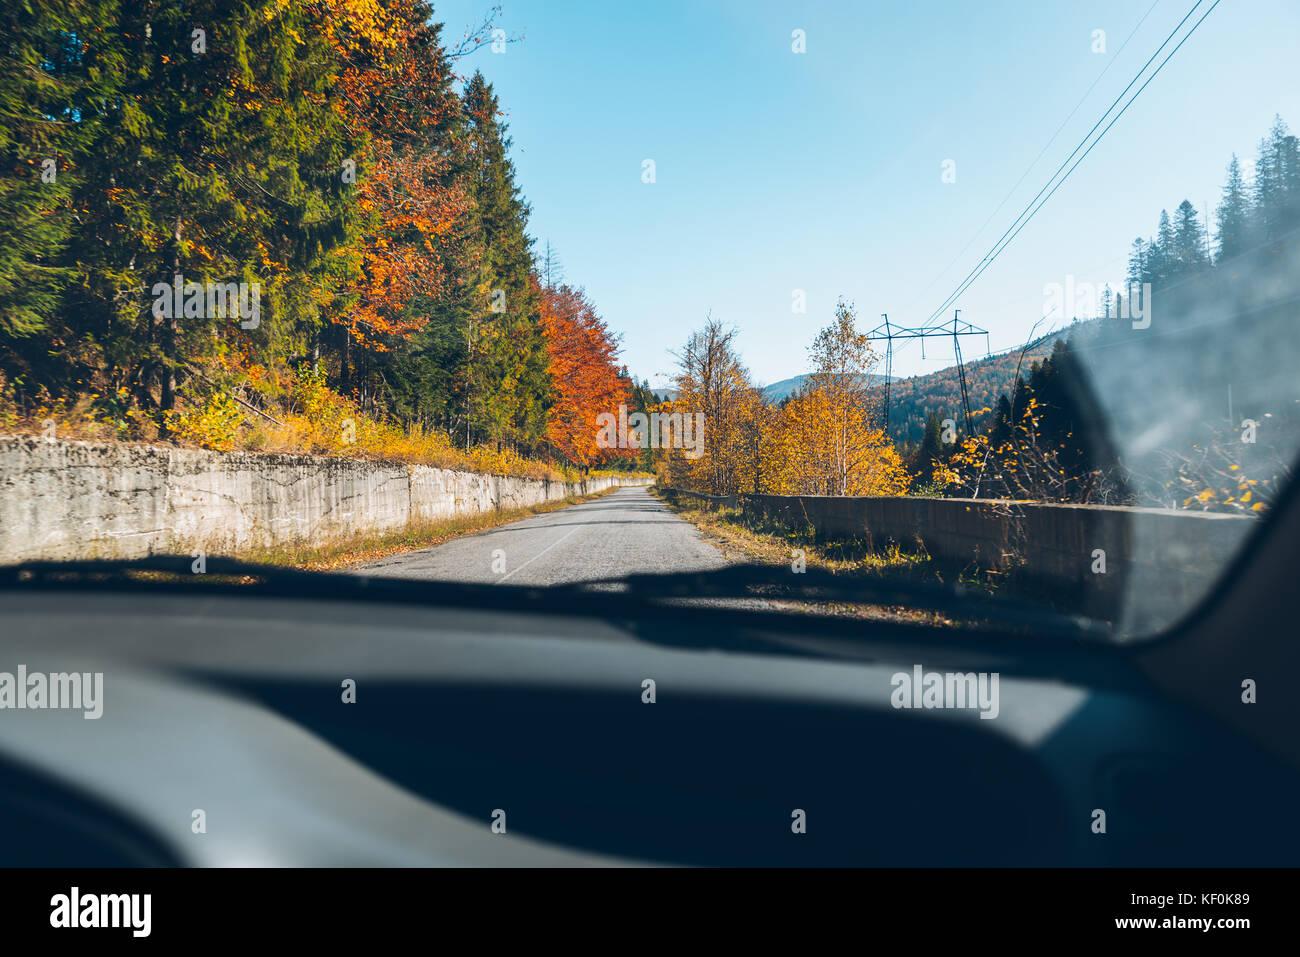 woman driving car in carpathian autumn mountains - Stock Image